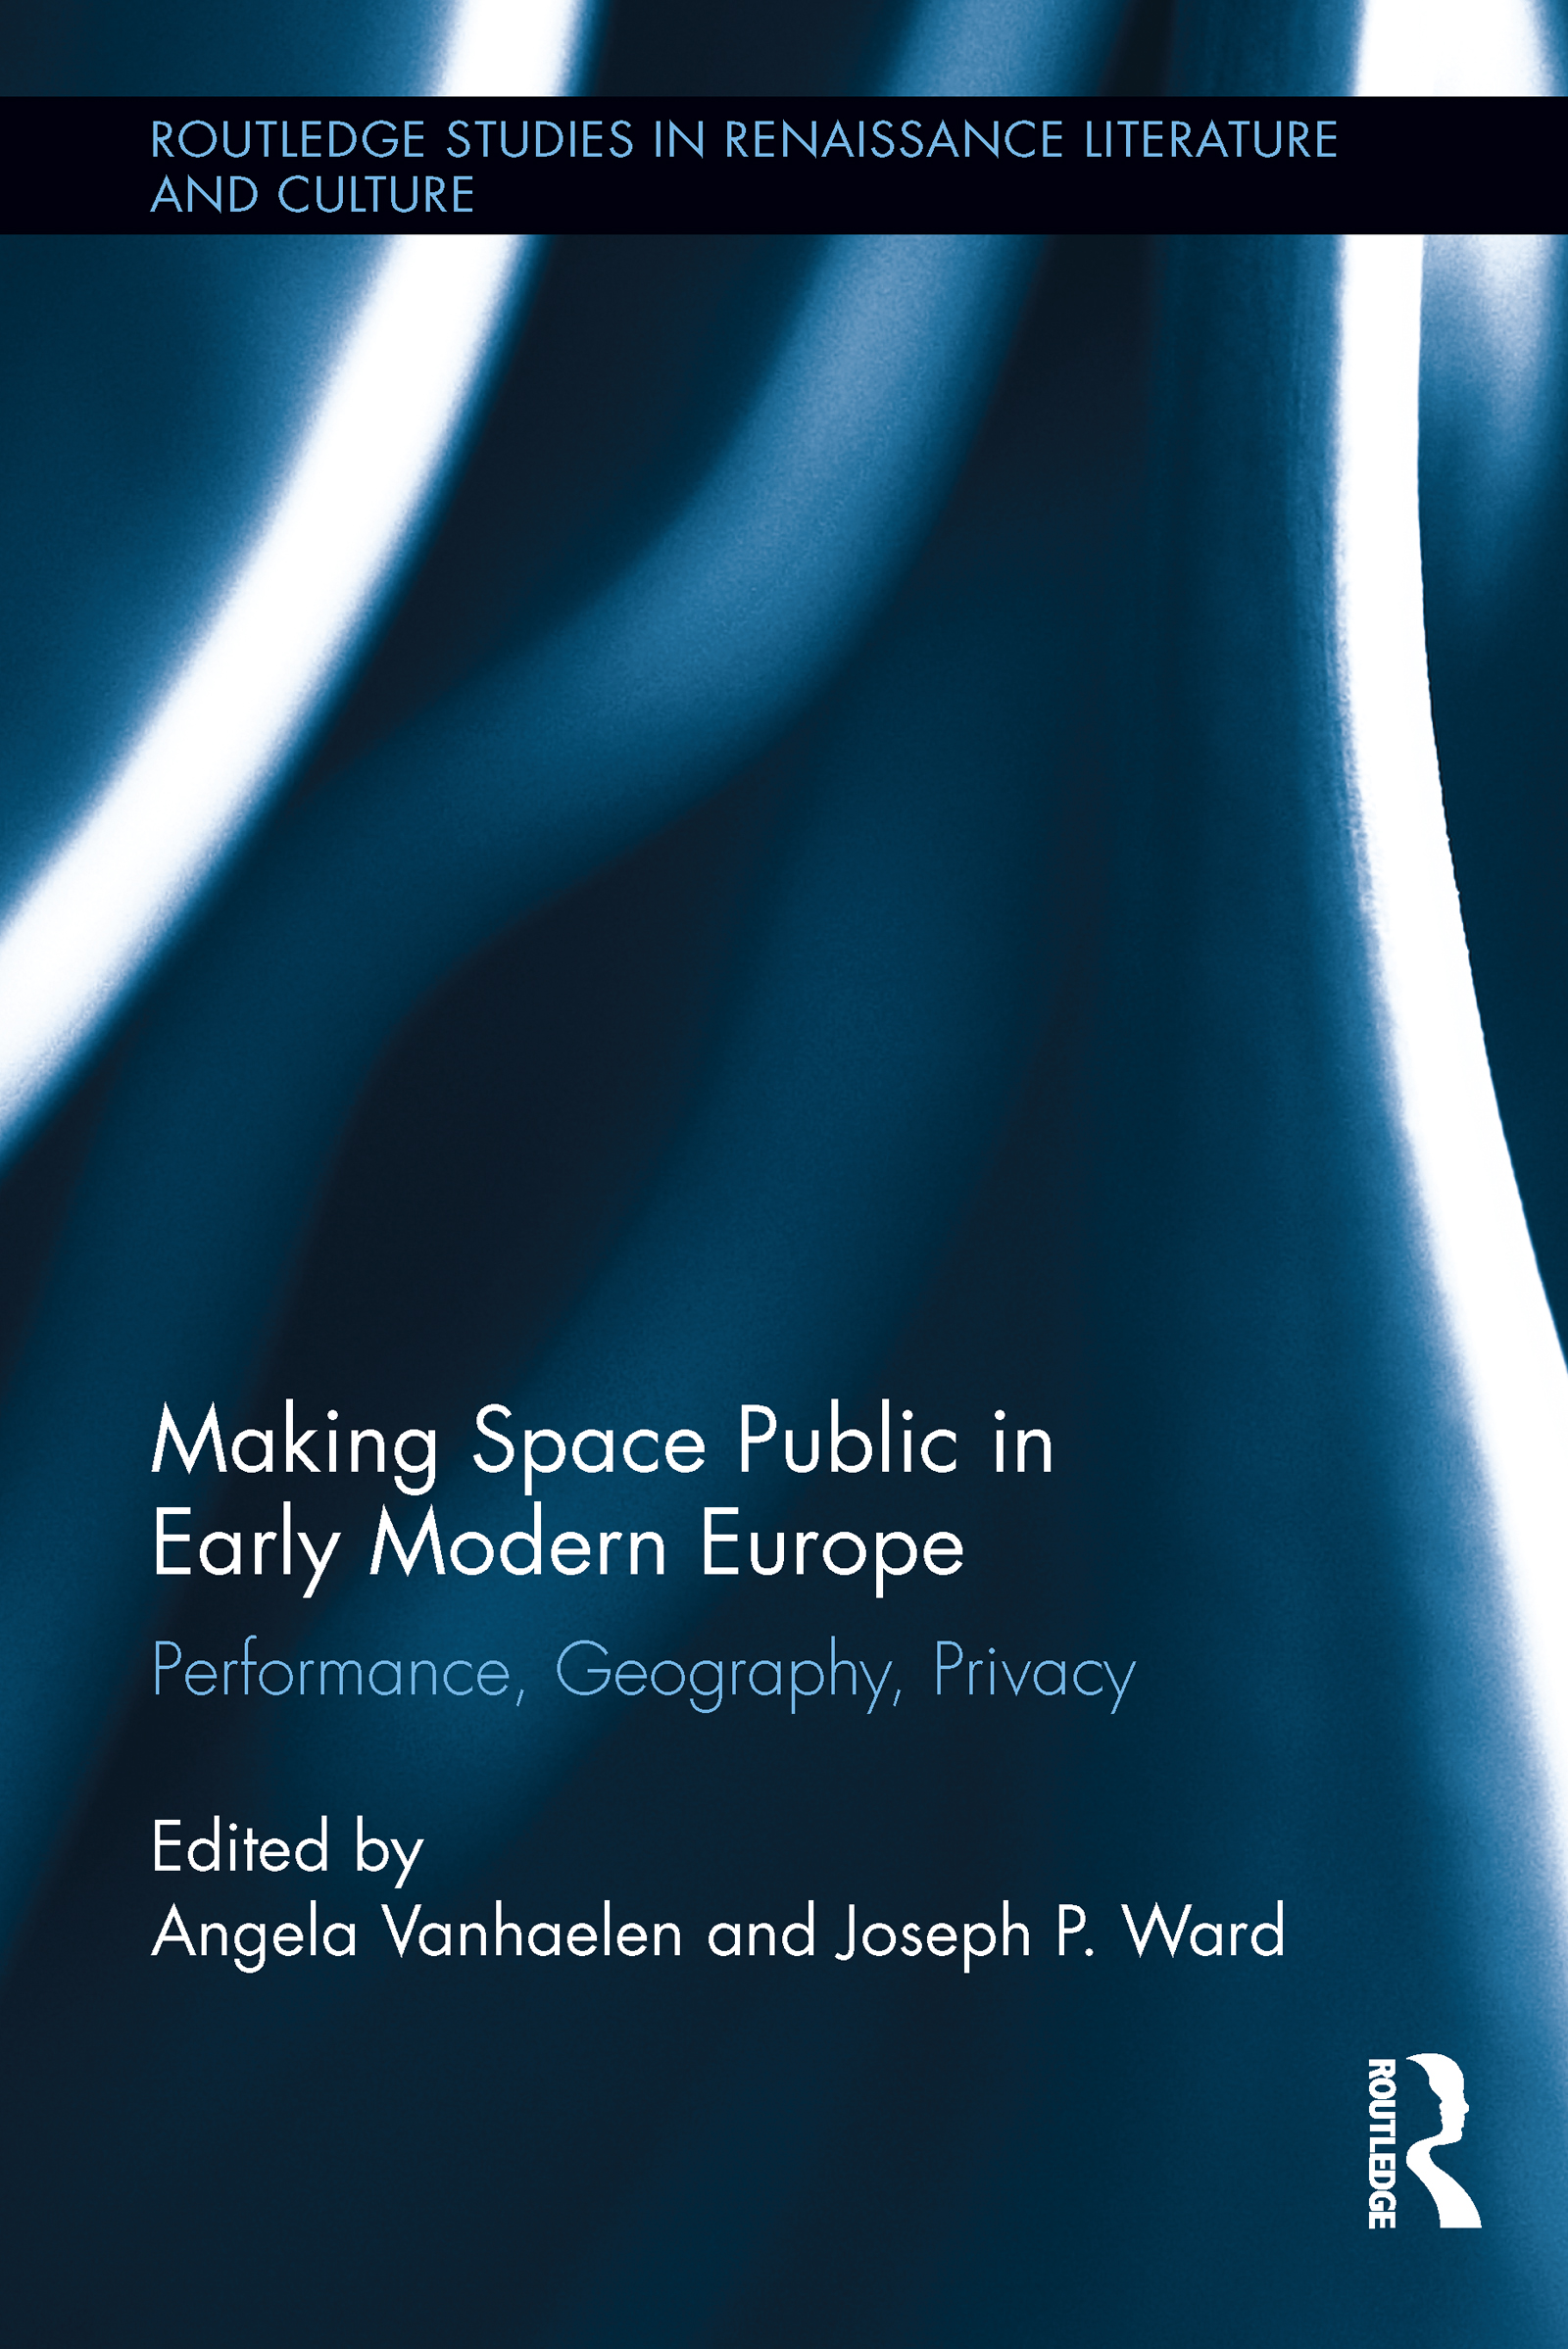 Making Space Public in Early Modern Europe